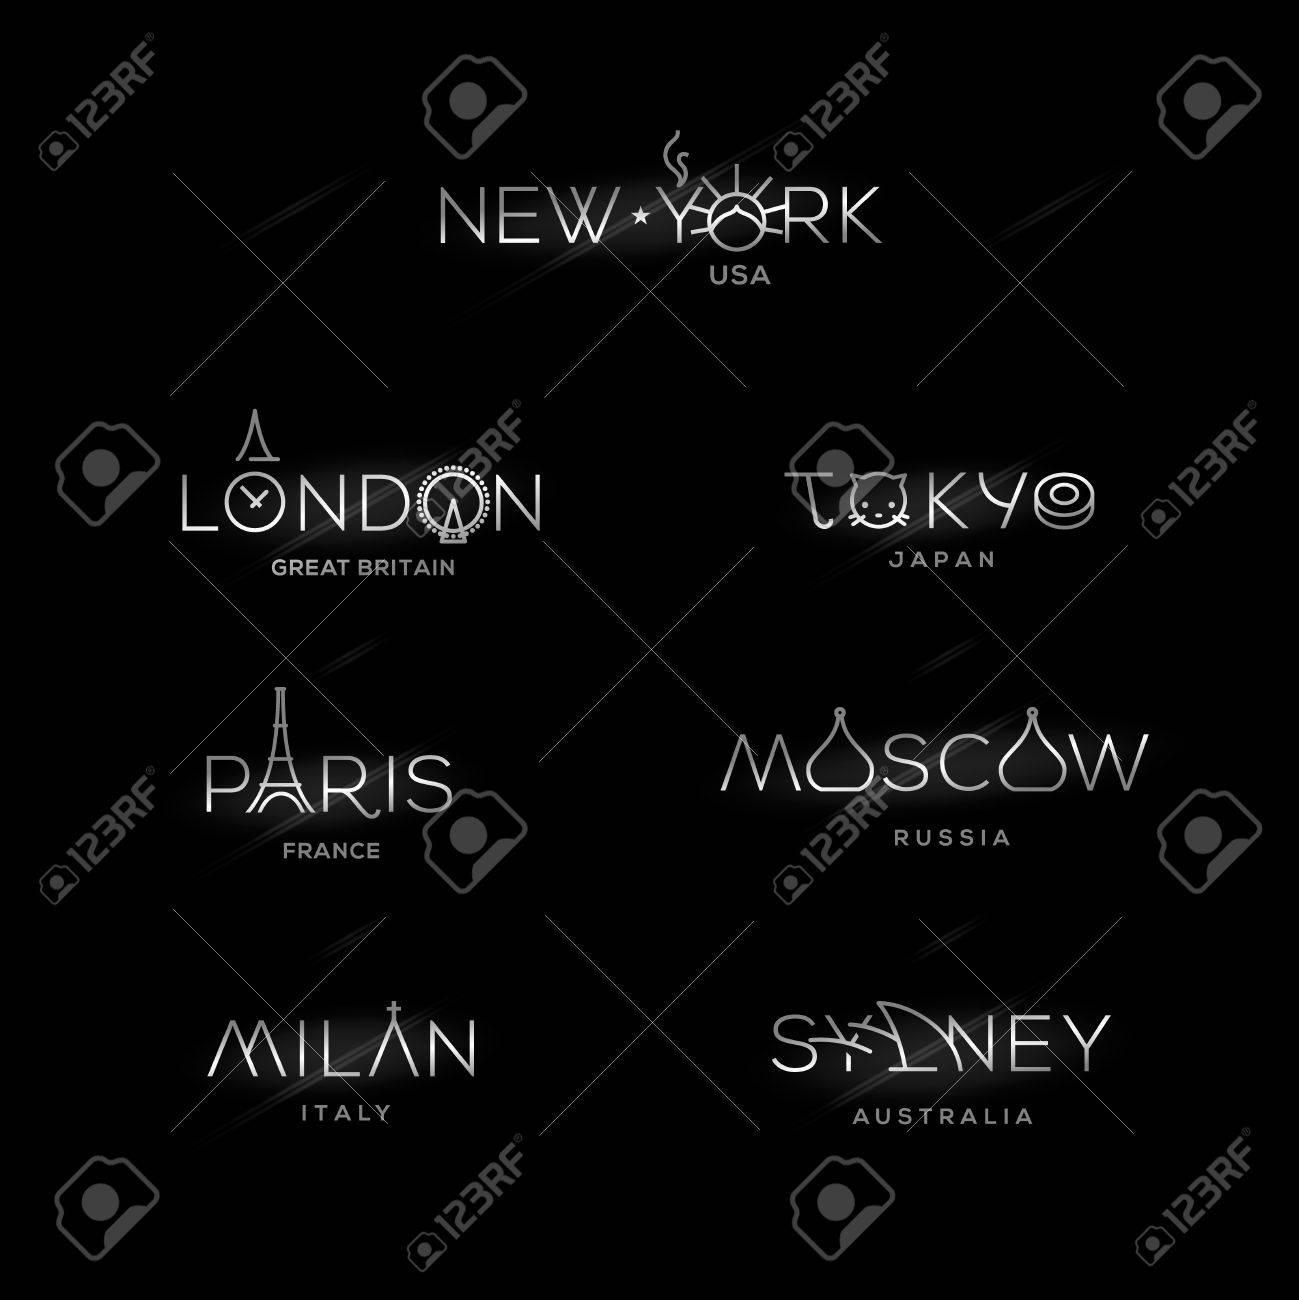 72b5717057f World Cities Labels - New York